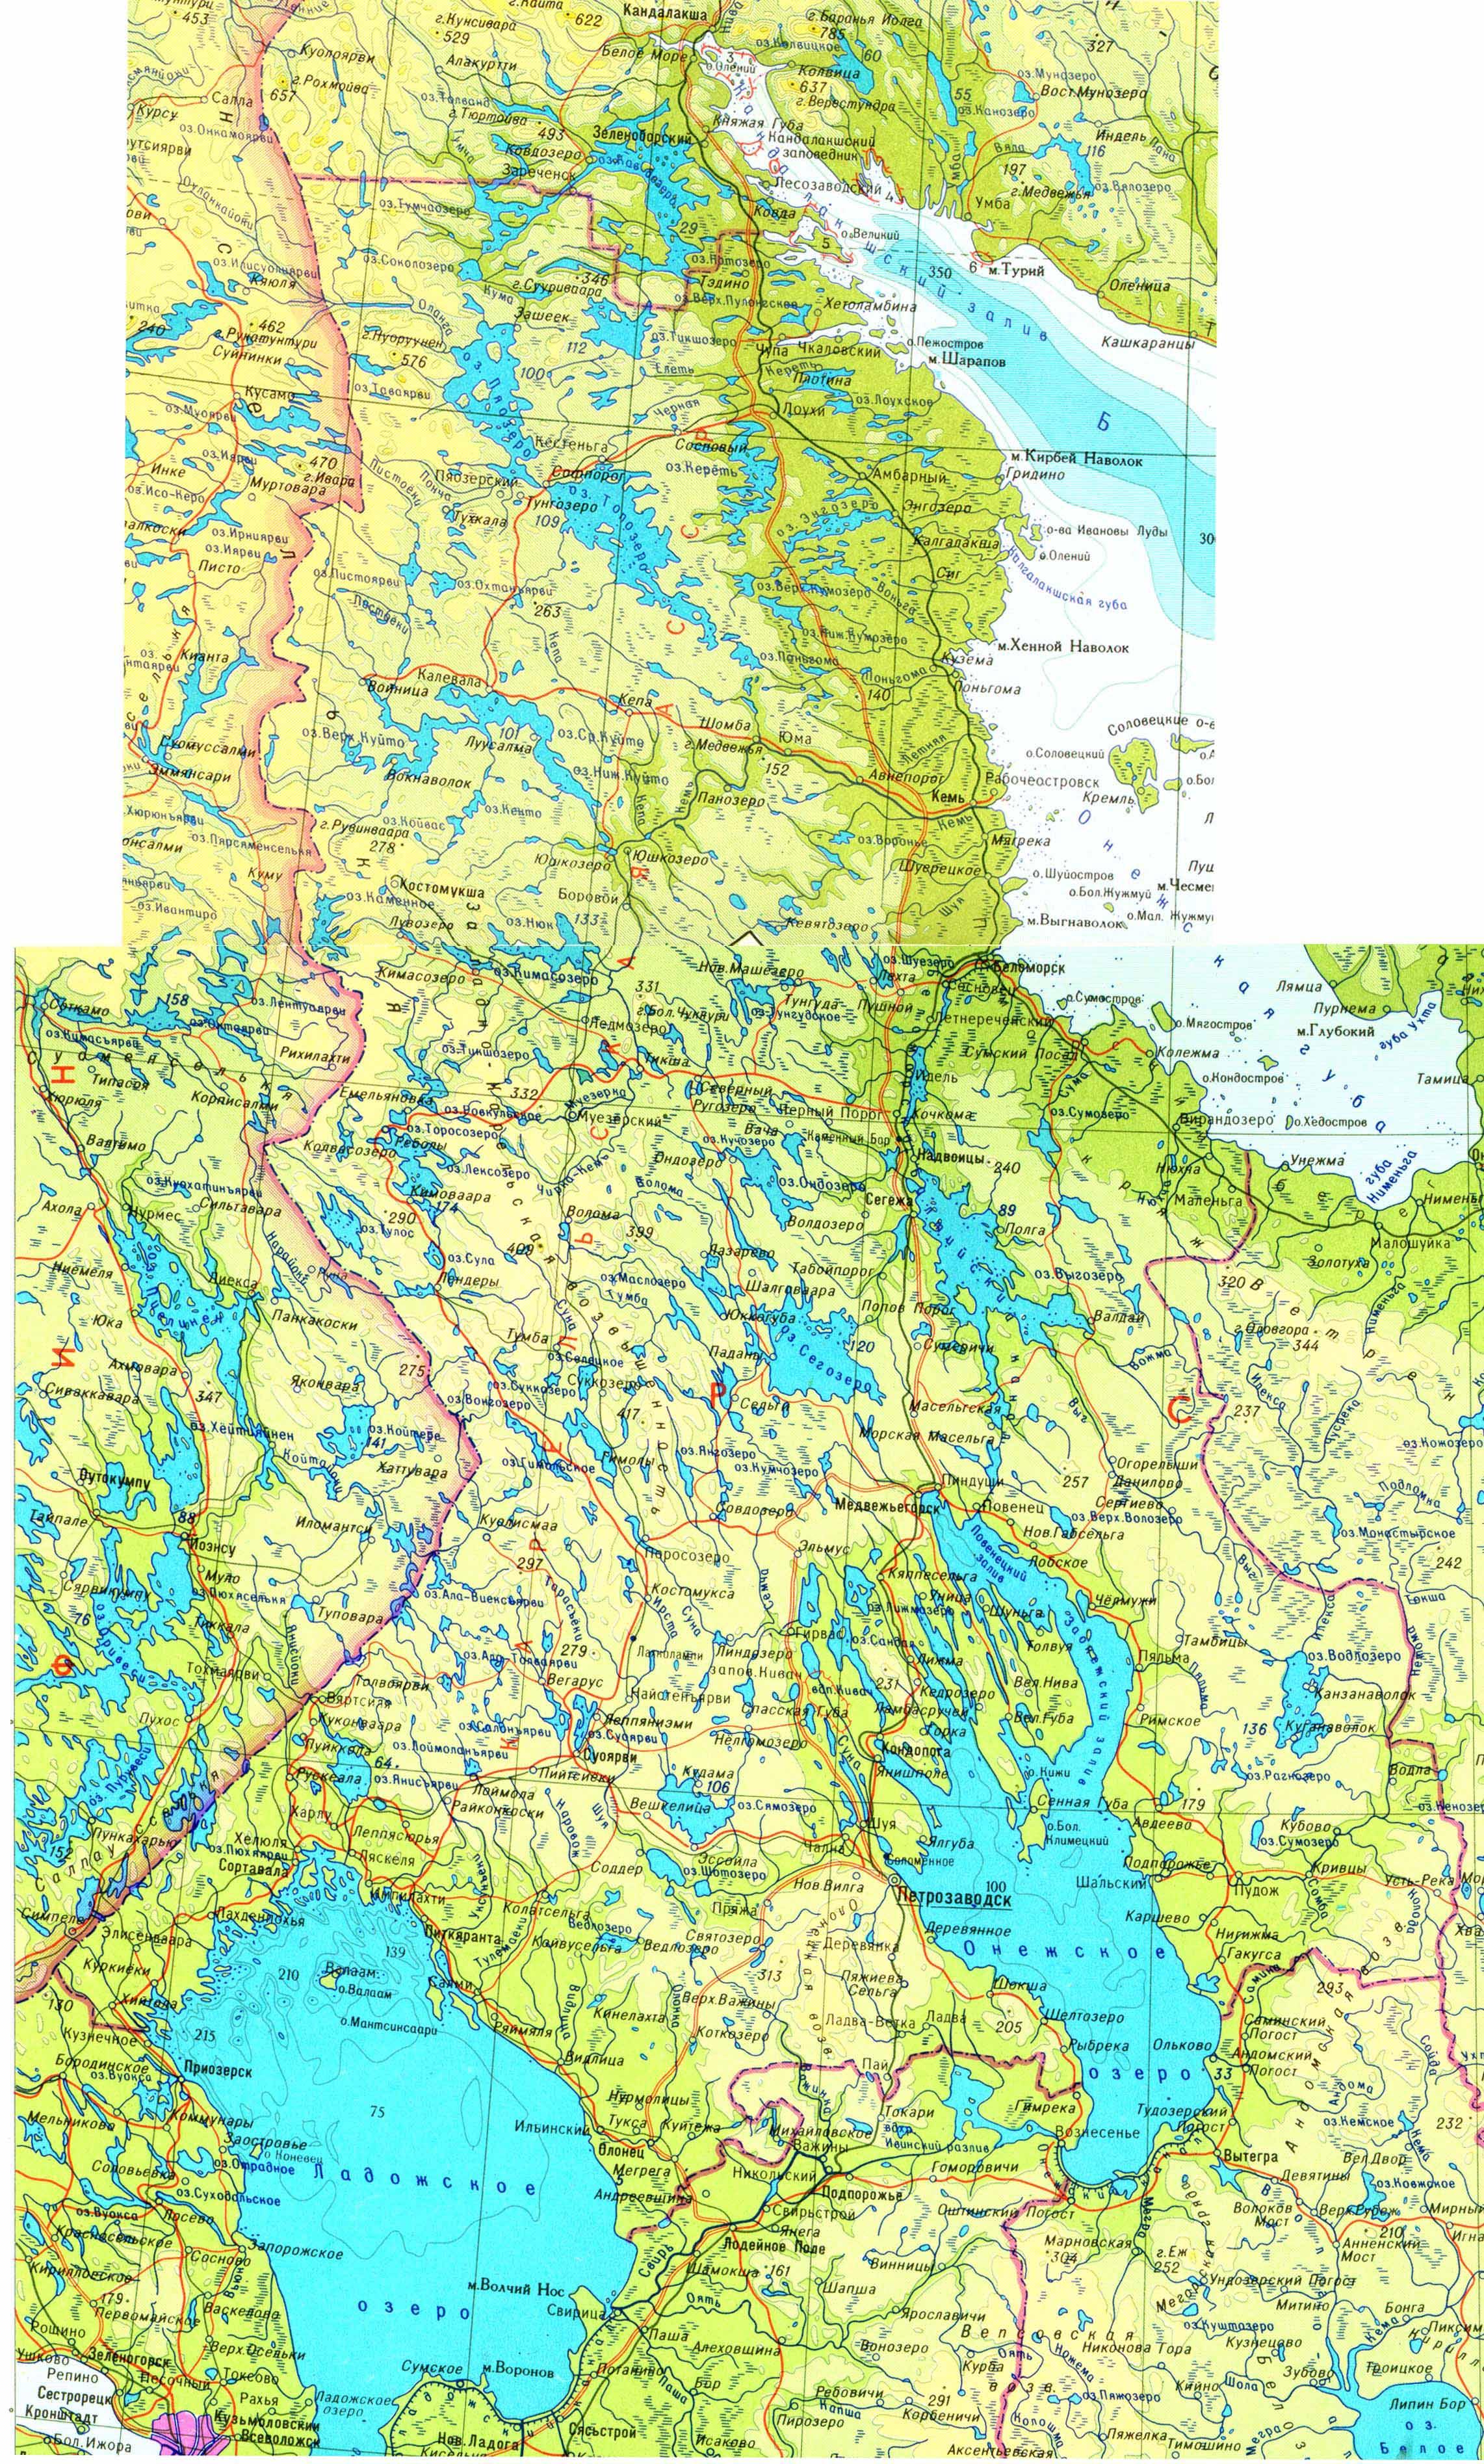 Скачать карту майнкрафт город - ae7